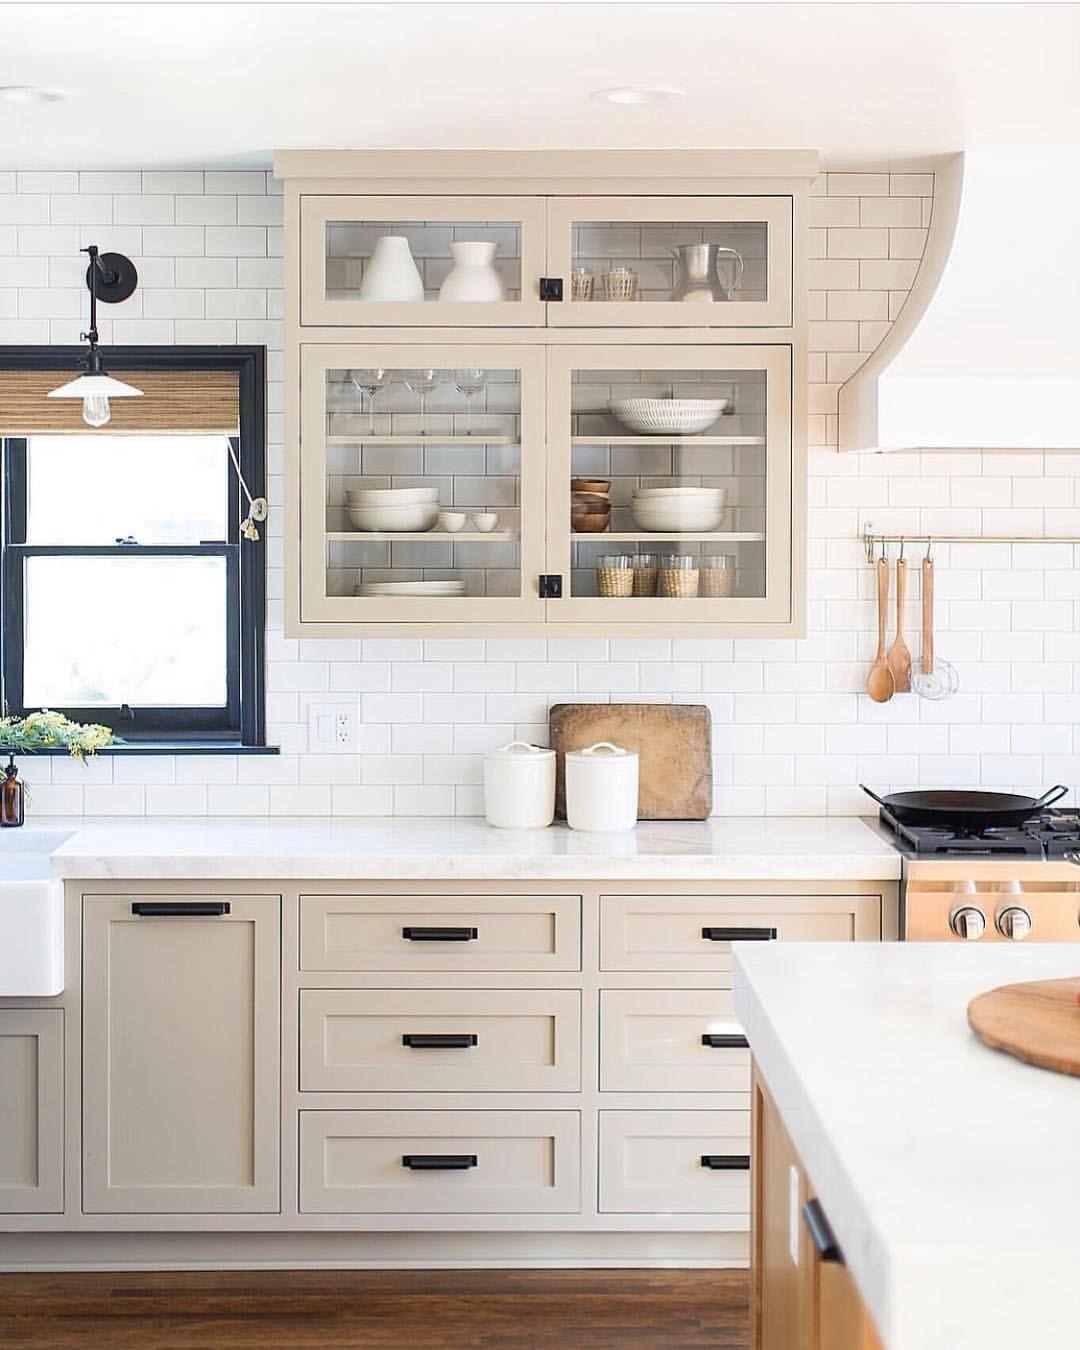 Window under kitchen cabinets  puttytan colored kitchen cabinets with white subway tile backsplash